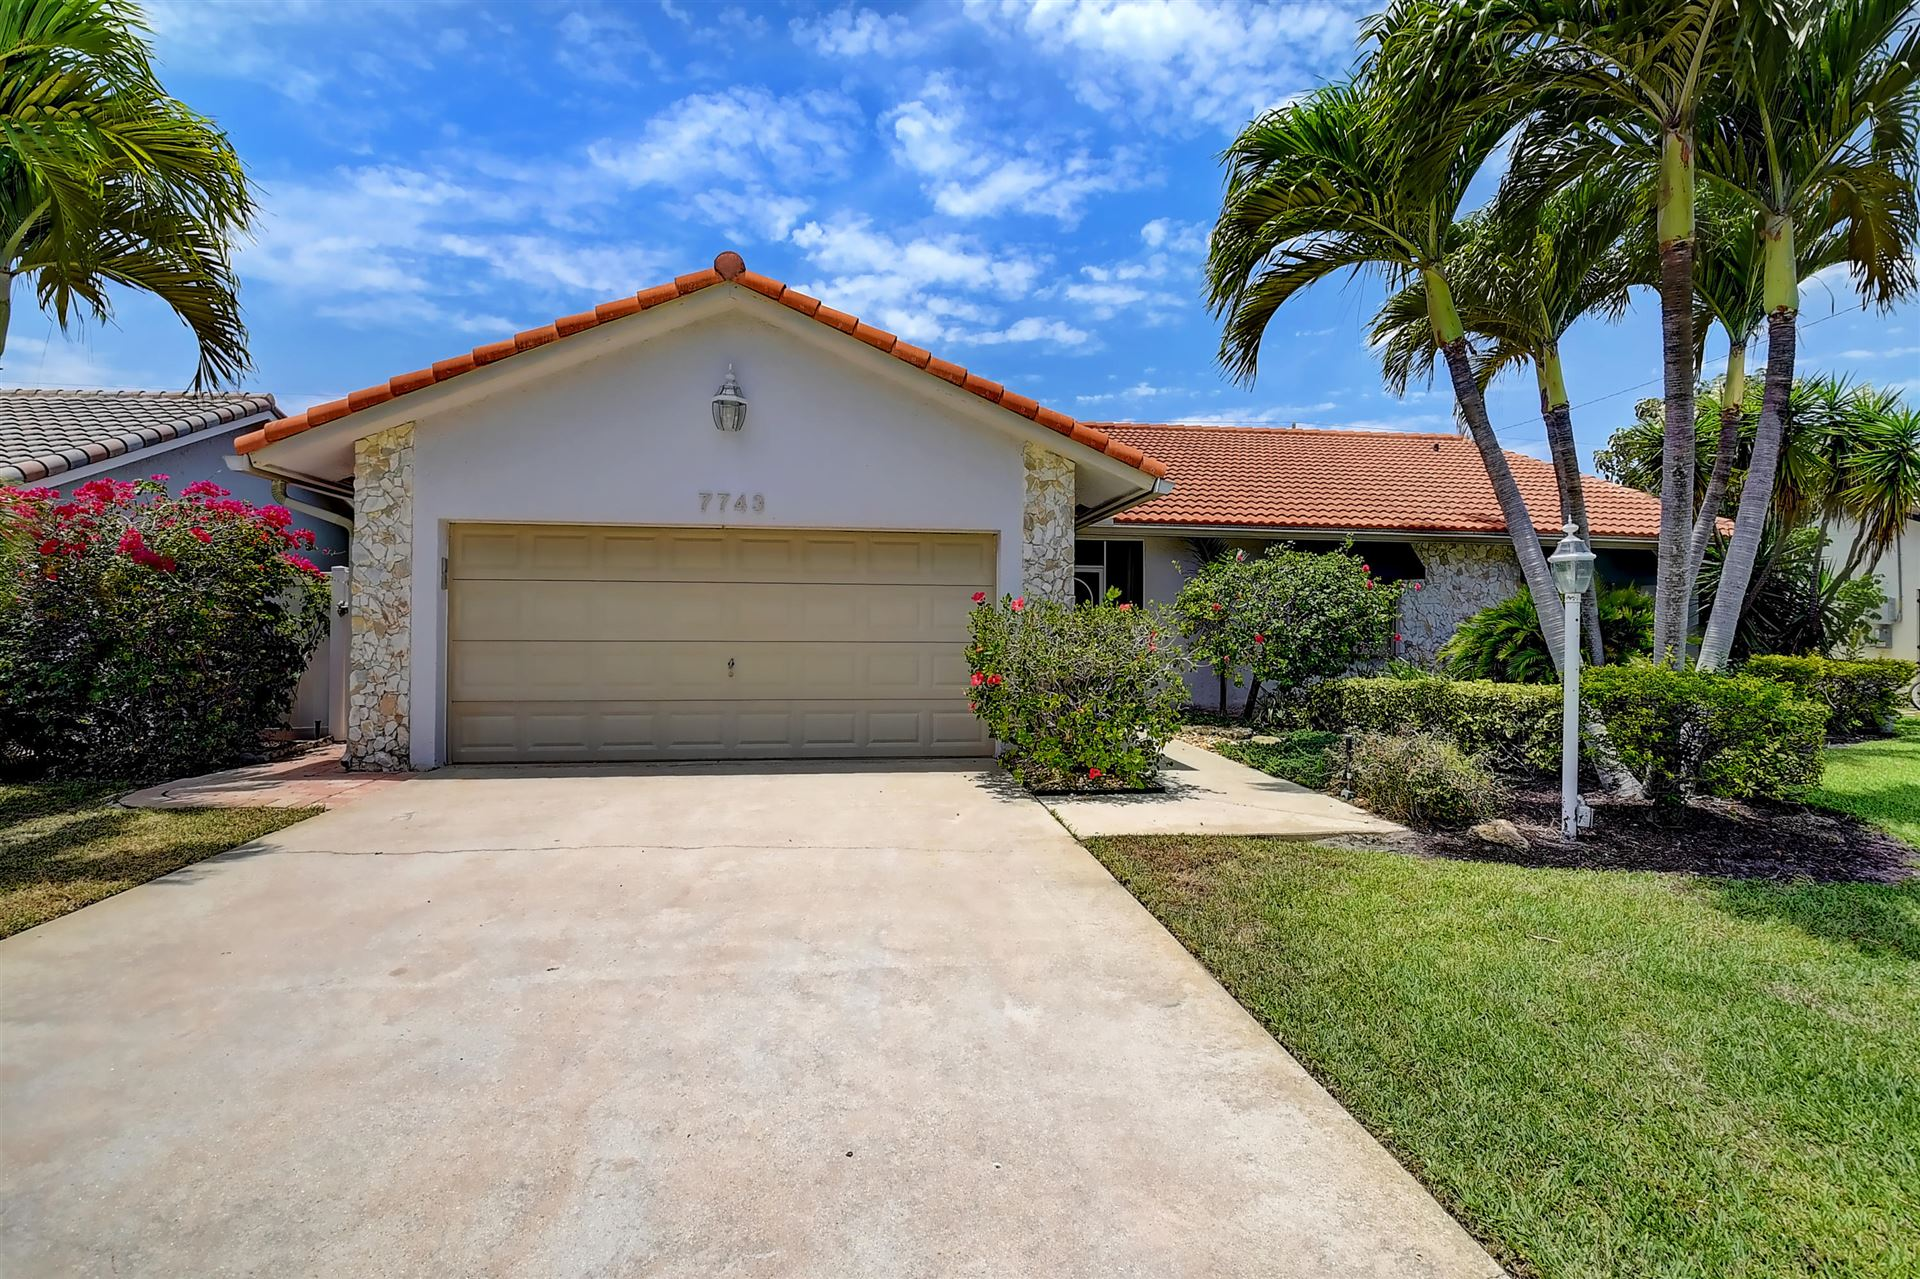 7743 W Country Club Boulevard, Boca Raton, FL 33487 - MLS#: RX-10720387